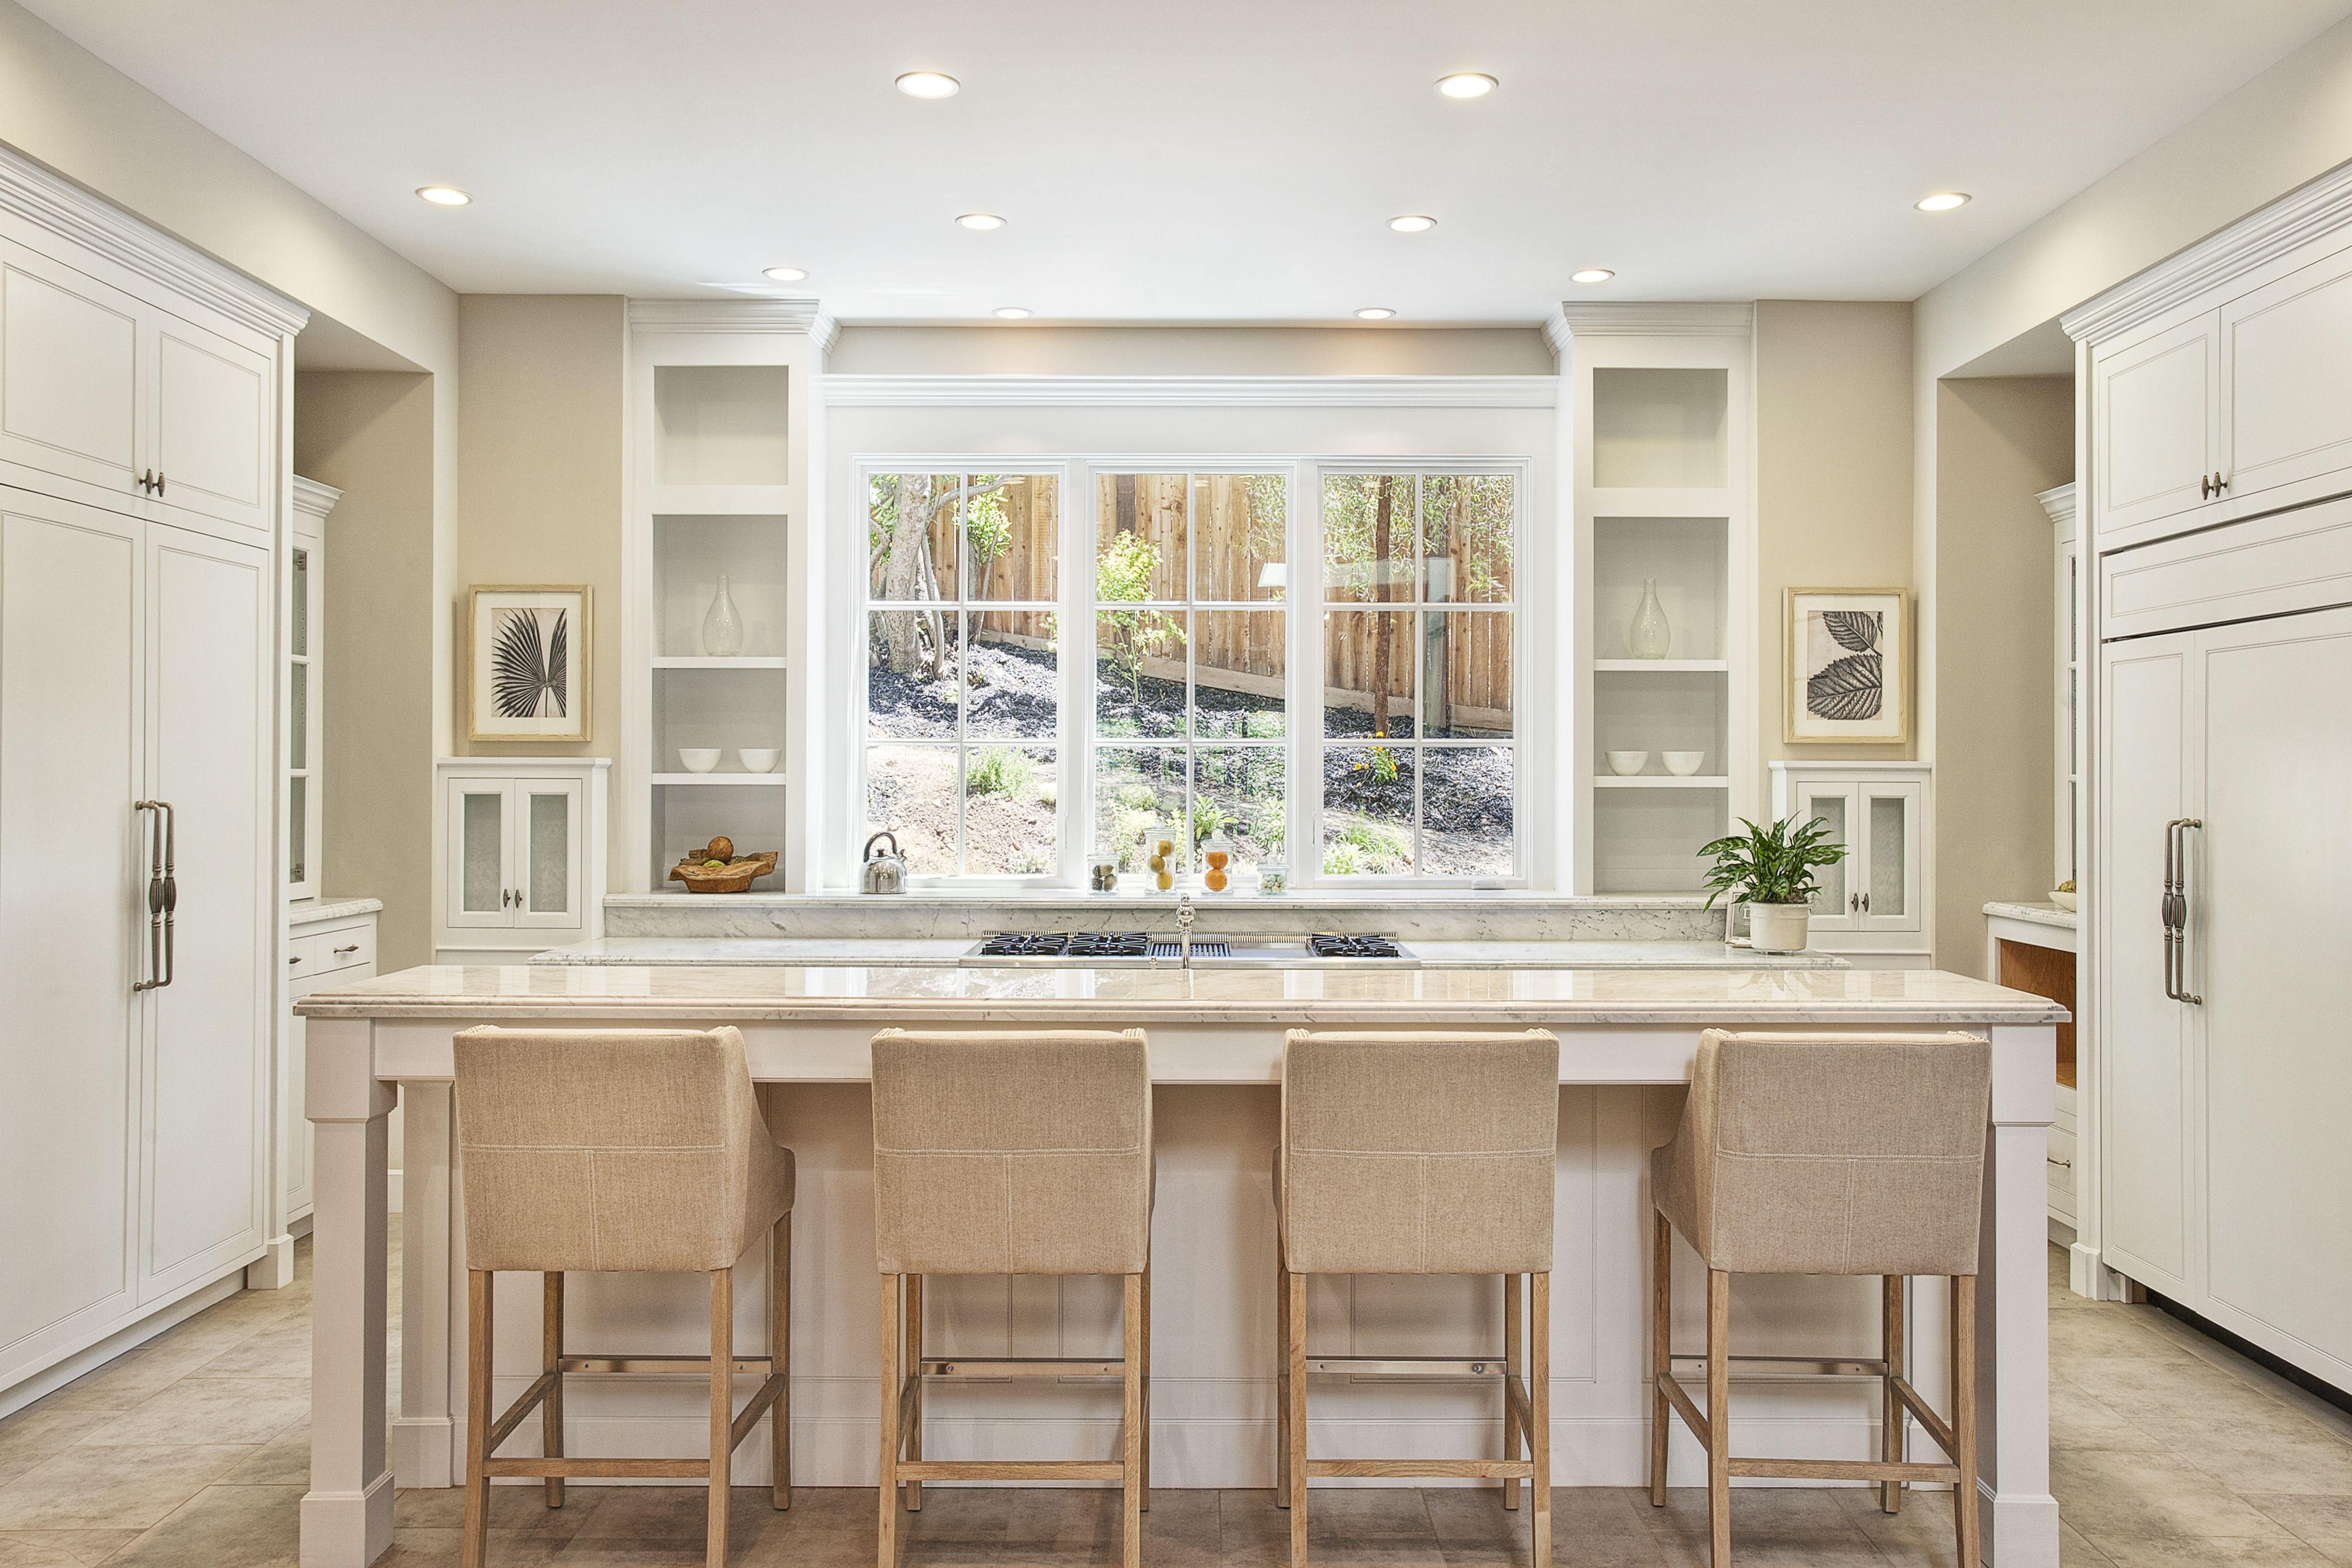 Kitchen Walls are Benjamin Moore Gray, the